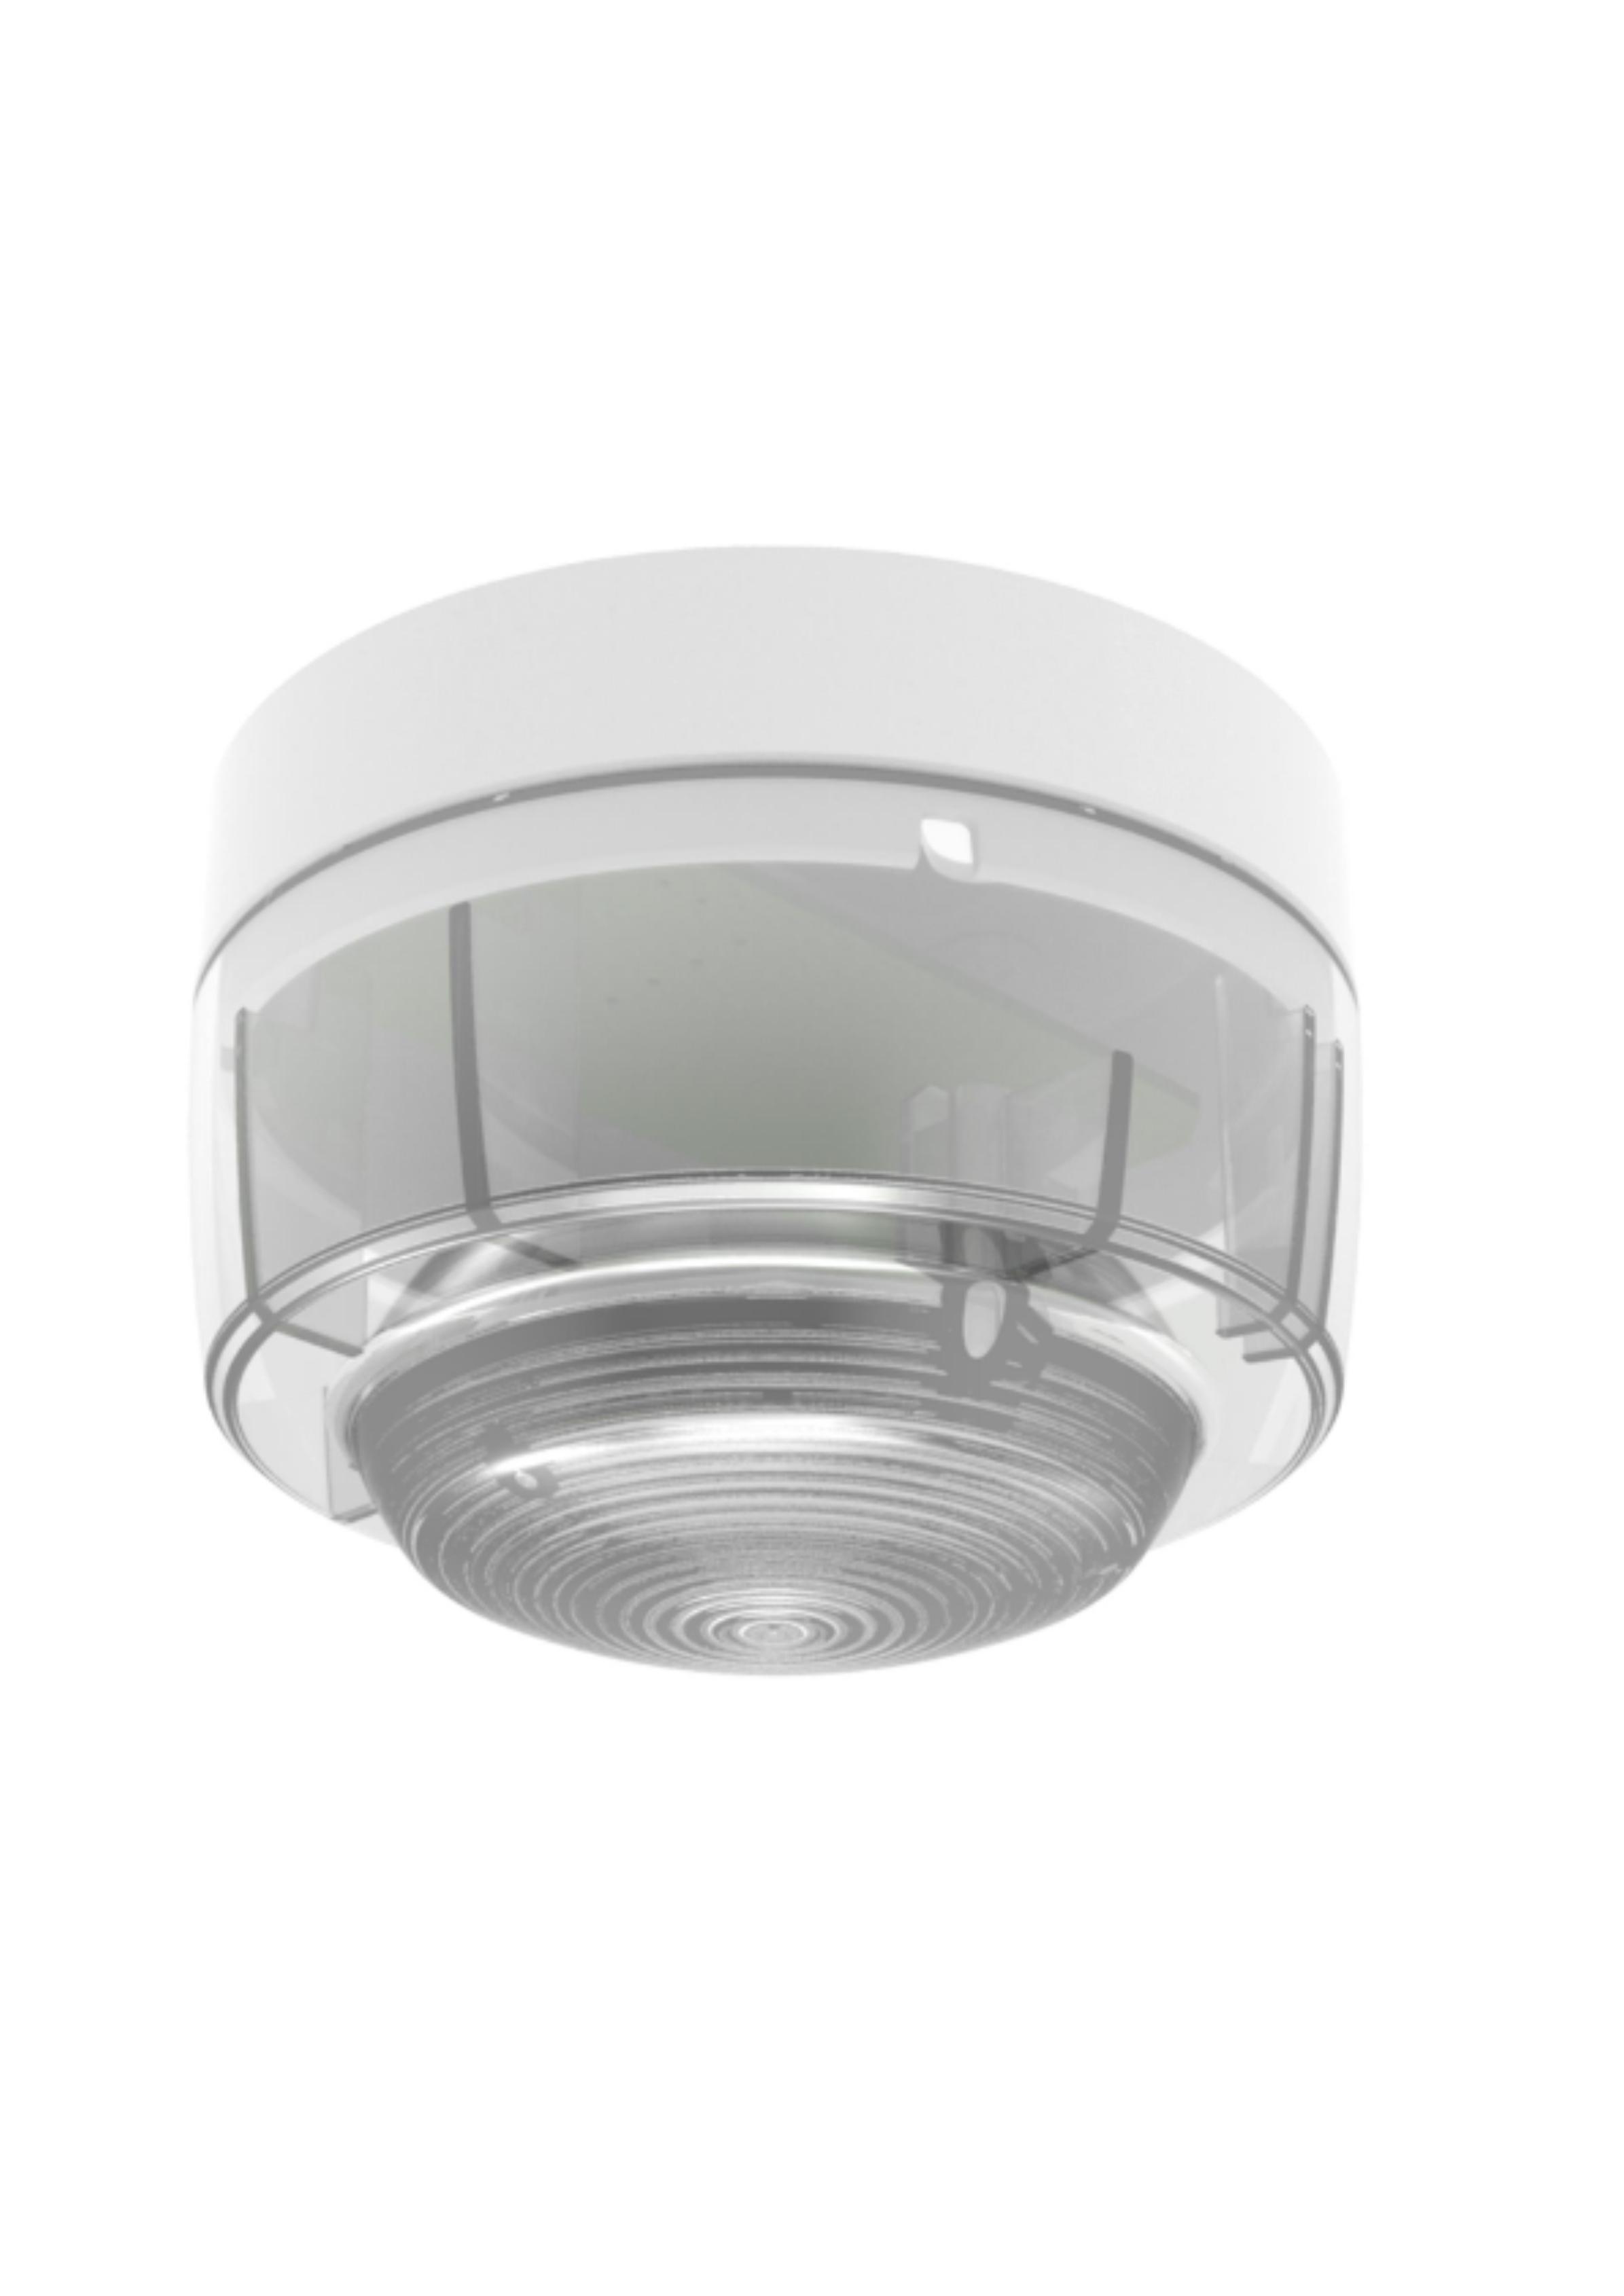 Conventional Beacon - White case, white LEDs 12601...